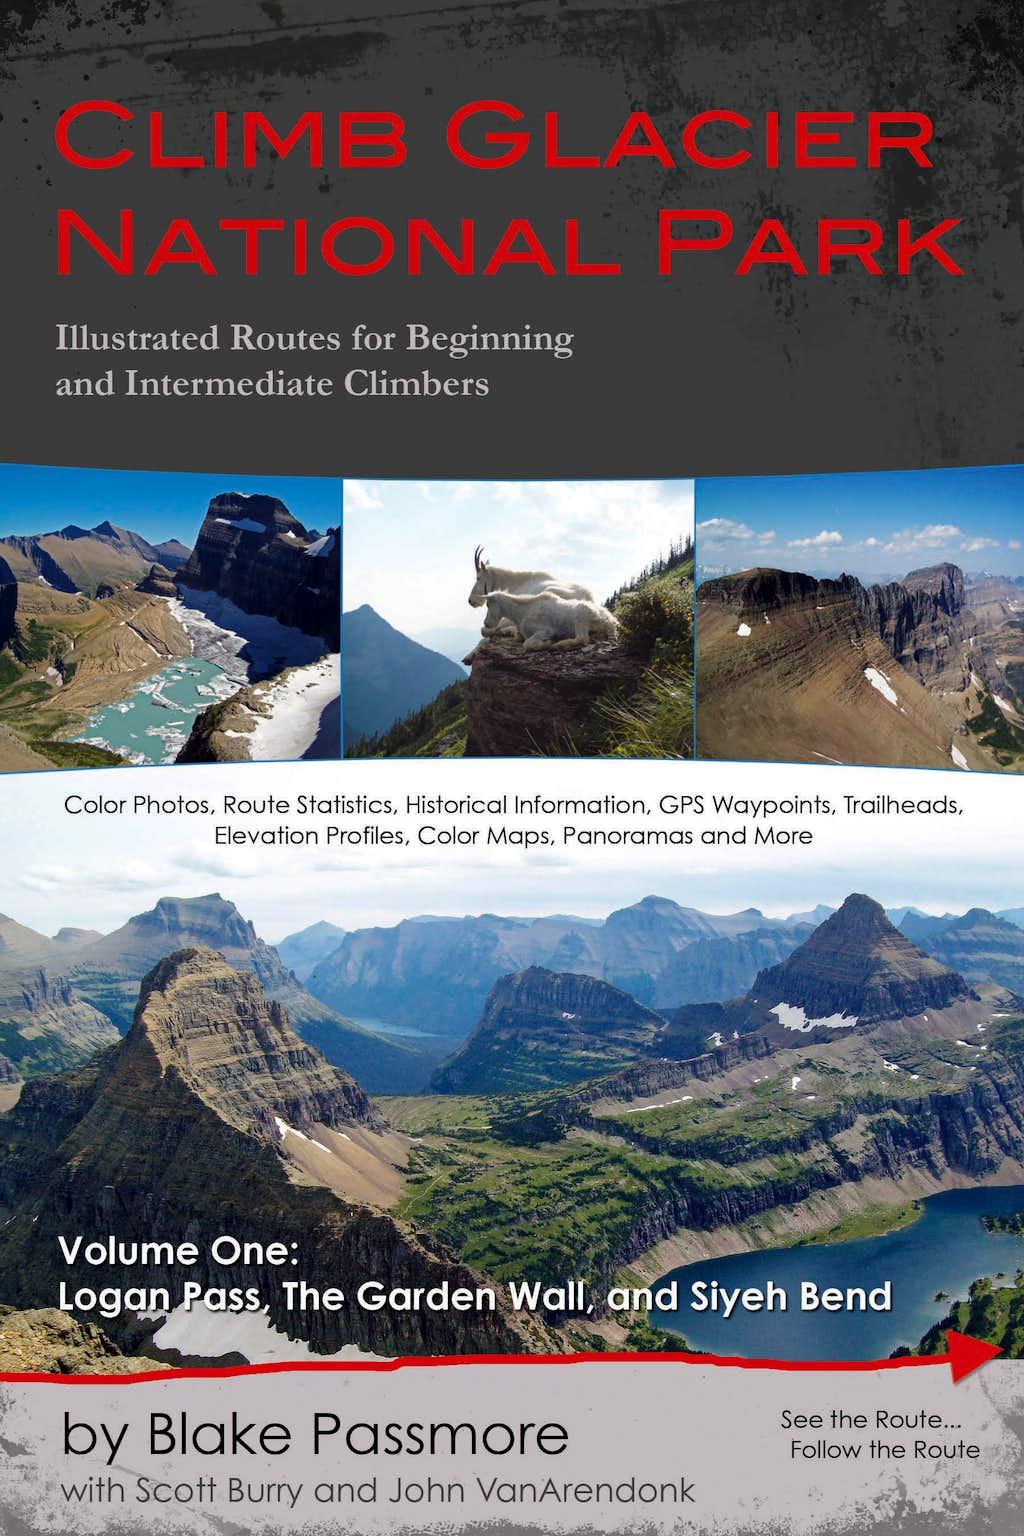 Climb Glacier National Park, Volume One